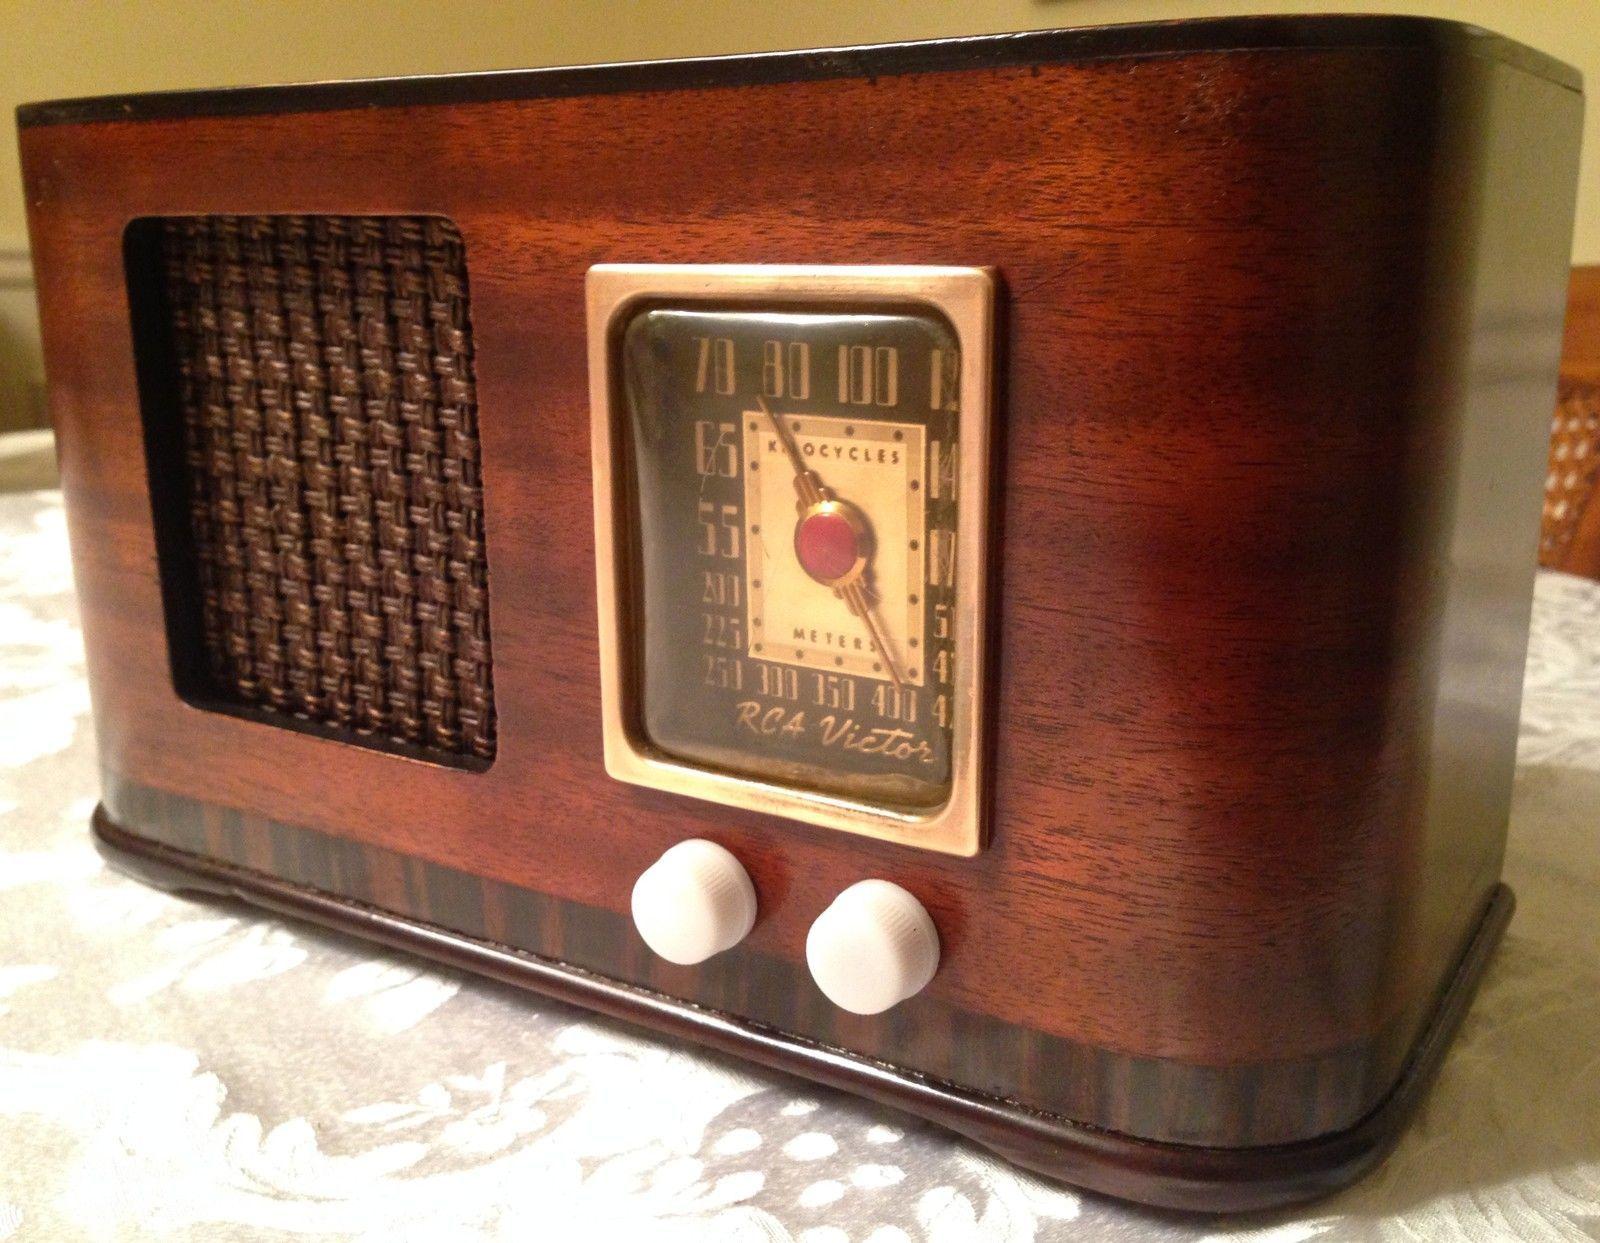 Very Nice Small 1940 Rca 45x3 Art Deco Radio Antique Radio Vintage Radio Retro Radios